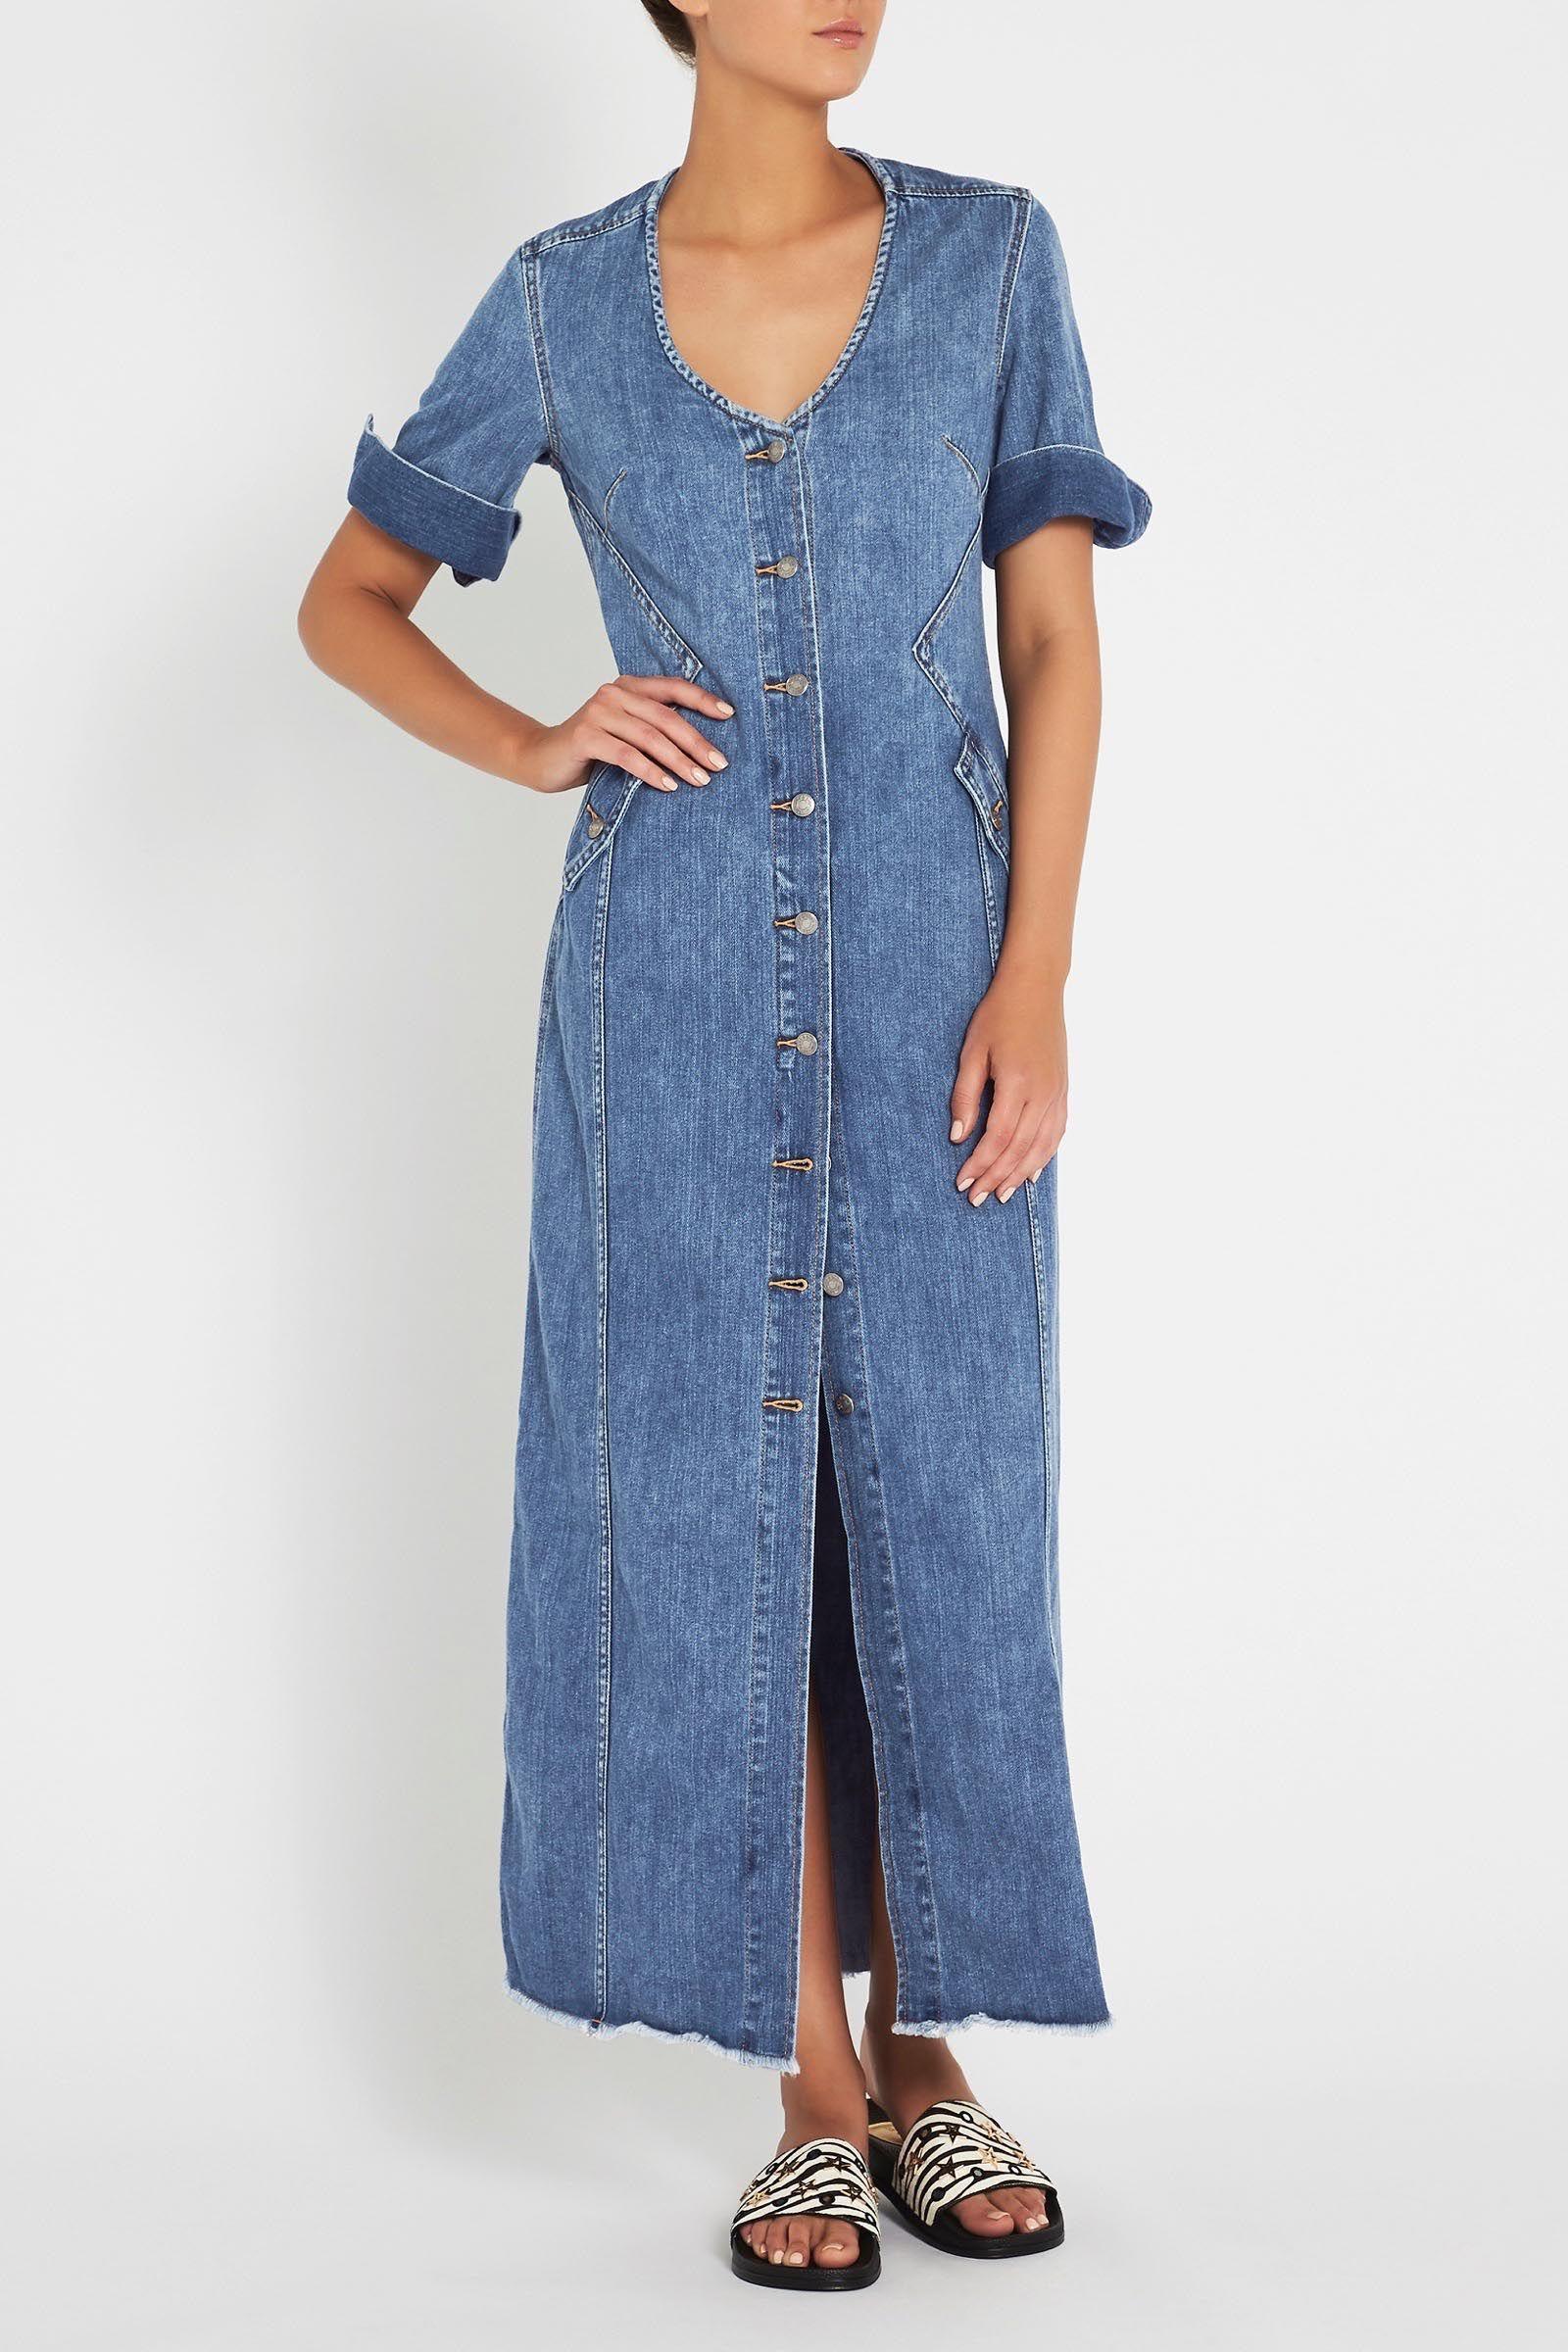 c9e278e93f3 THE REVELLERS LONG DRESS Denim maxi dress  sassandbide sass   bide  Australia shop online with